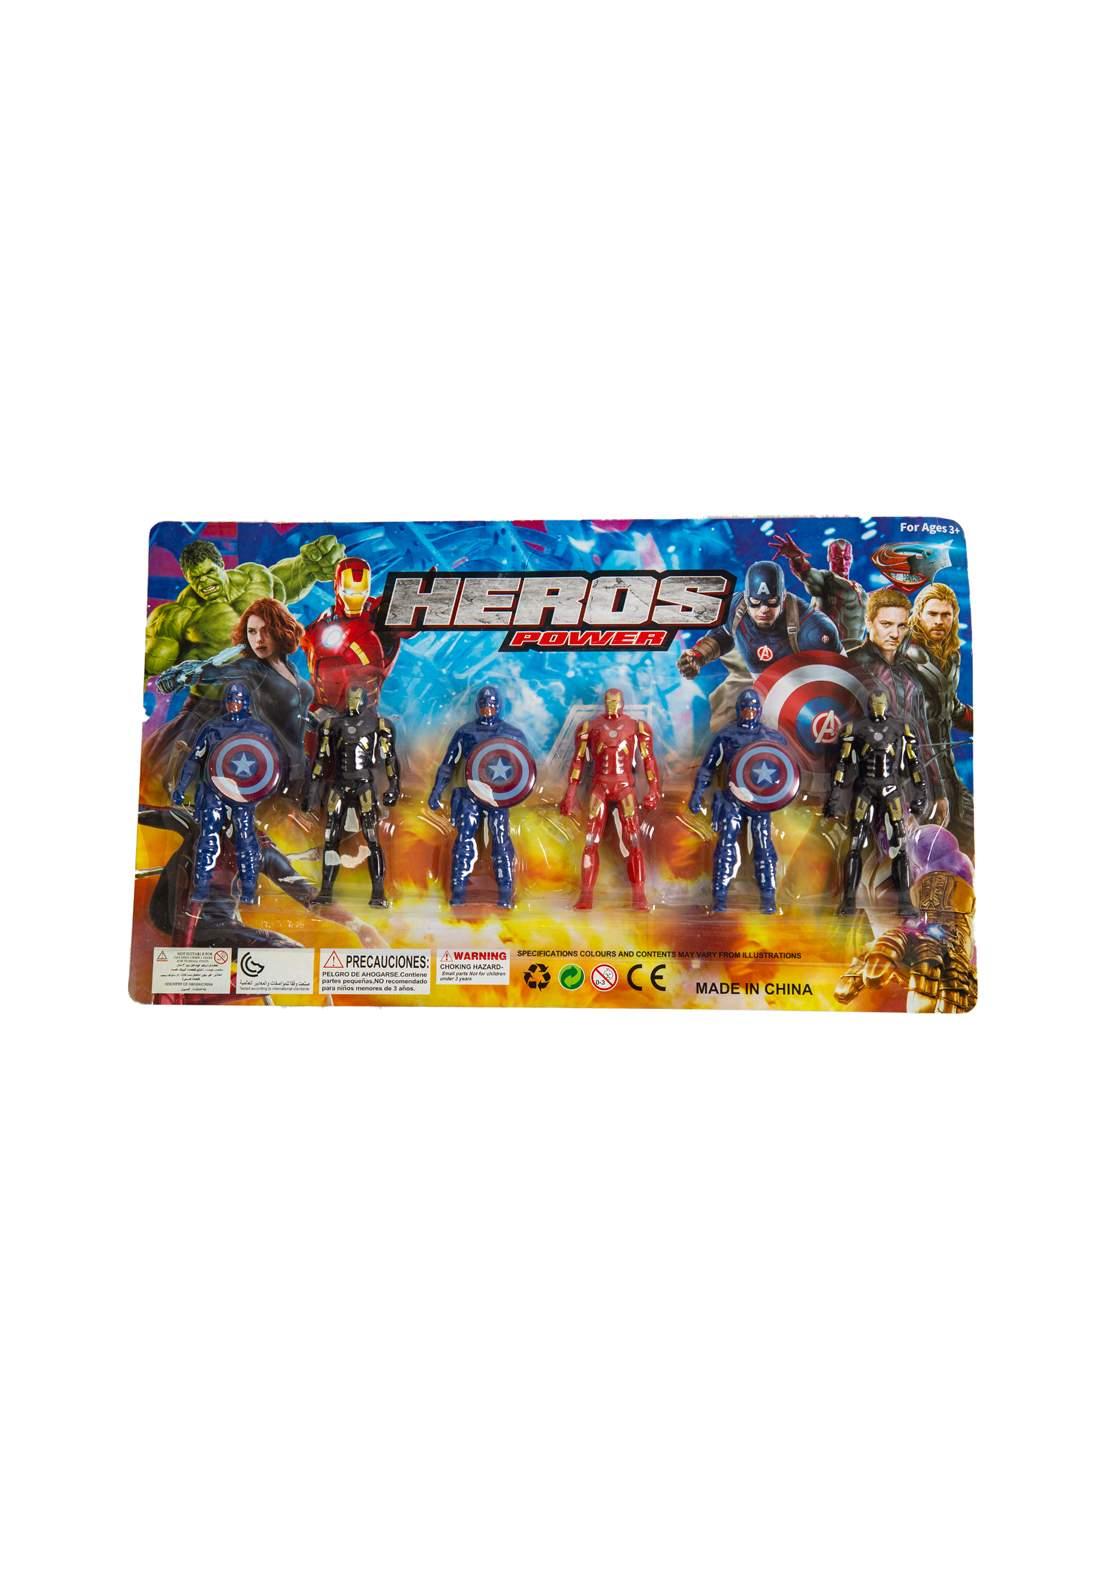 Super Heroes Game For Kids لعبة الأبطال للأطفال